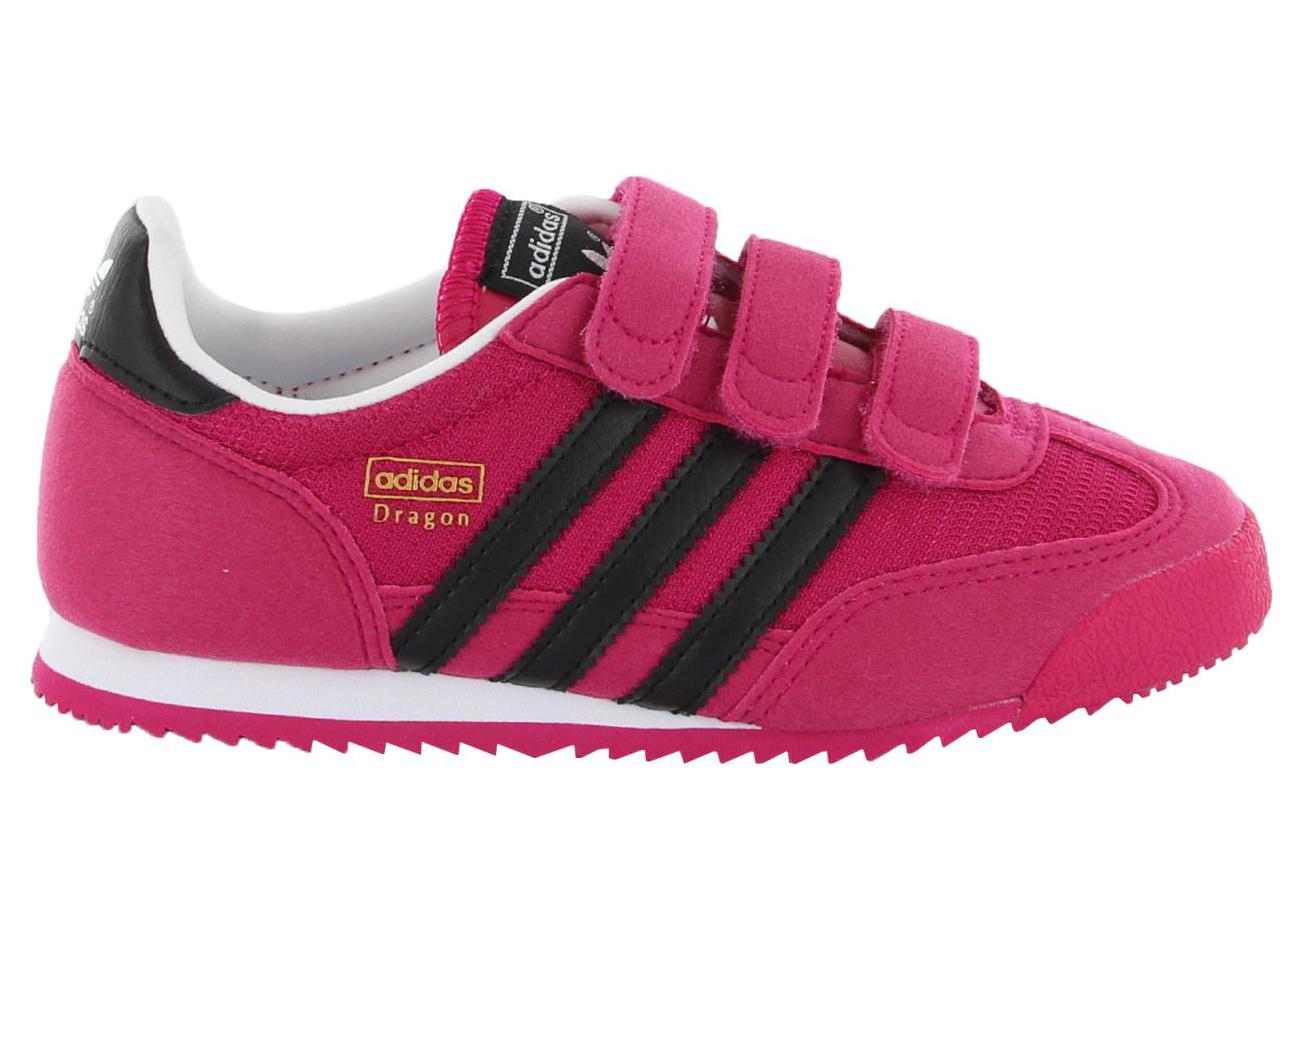 d0e6cf8c633fa Adidas Dievčenské tenisky DRAGON J - ružové, EUR 31   BabyRecenzie.sk